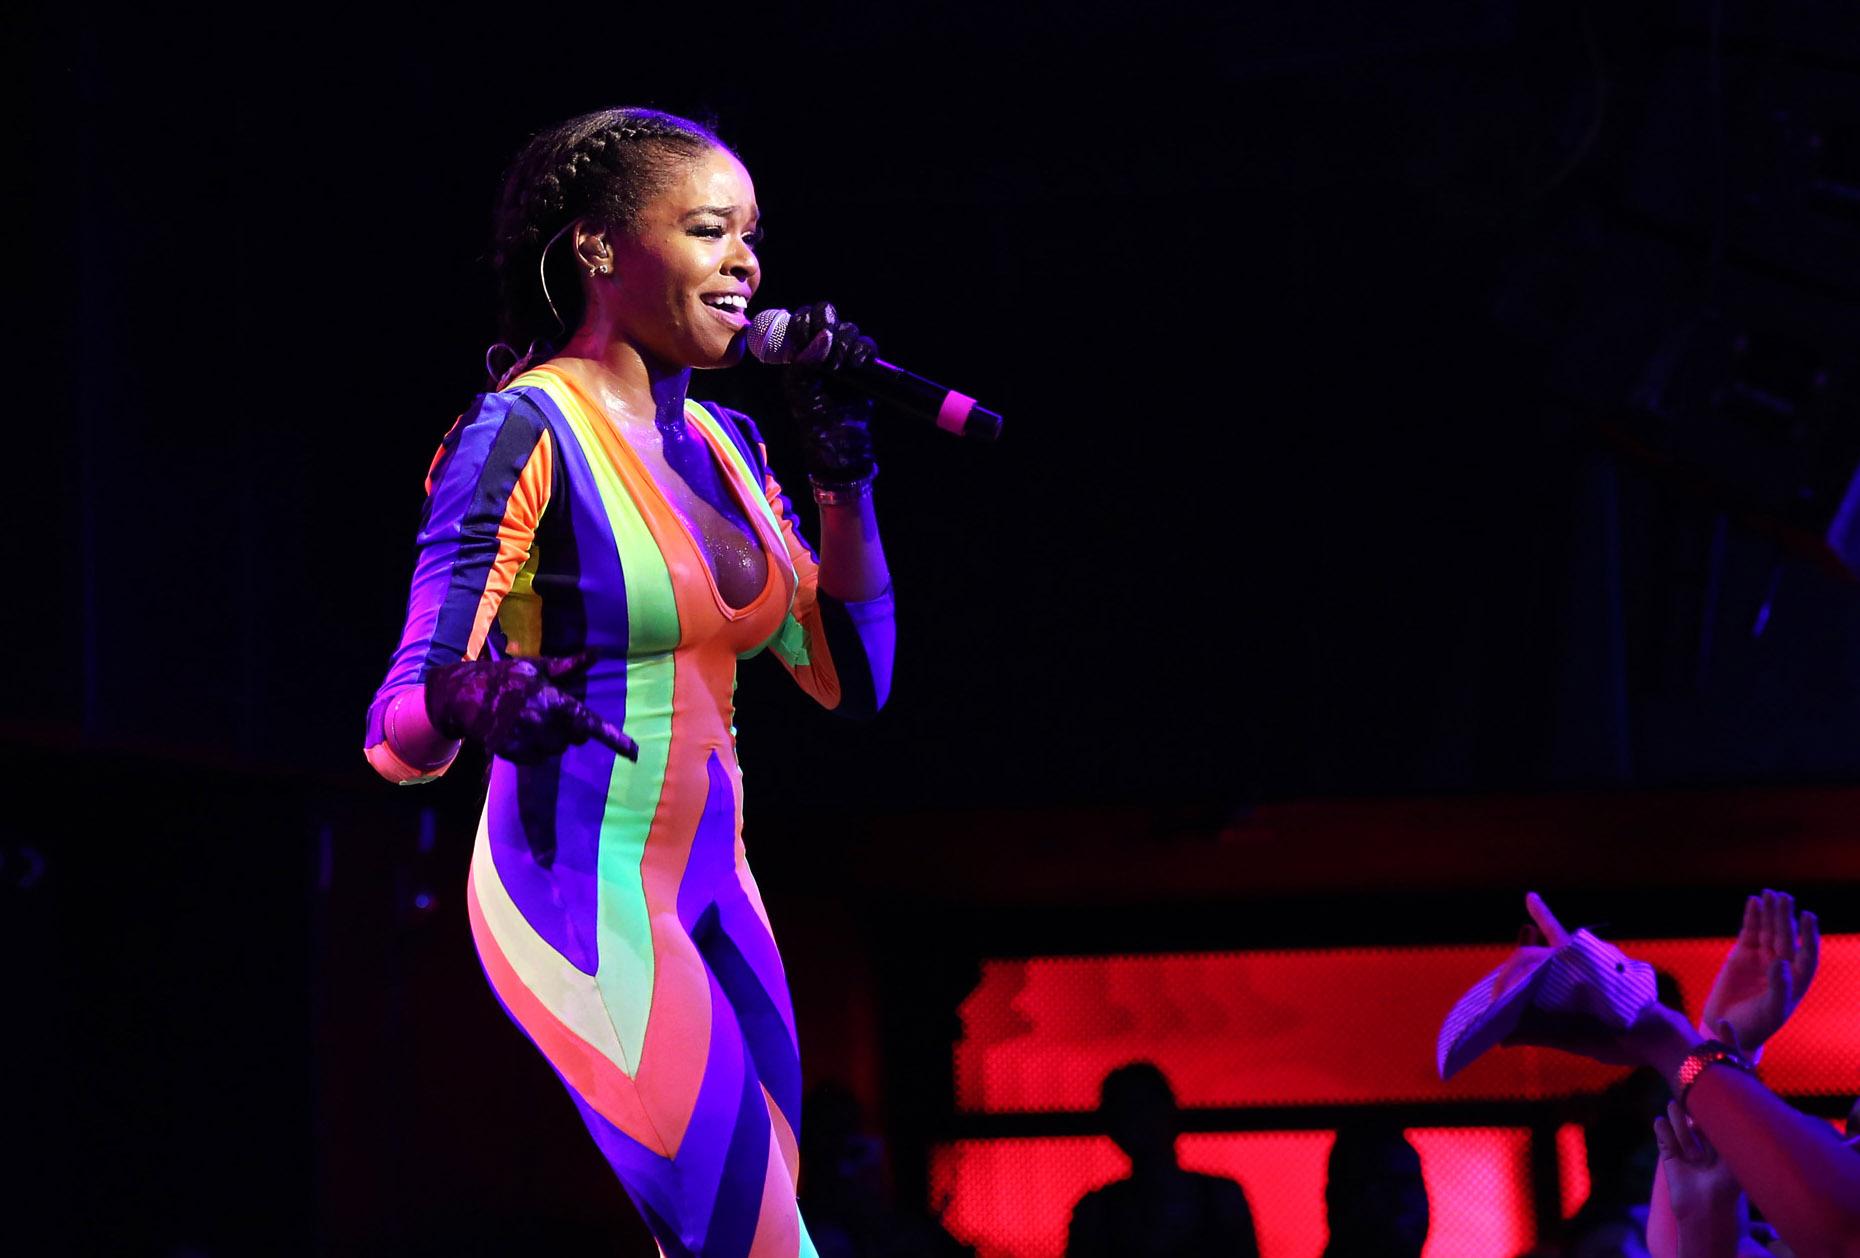 Azealia Banks In Concert - New York, New York